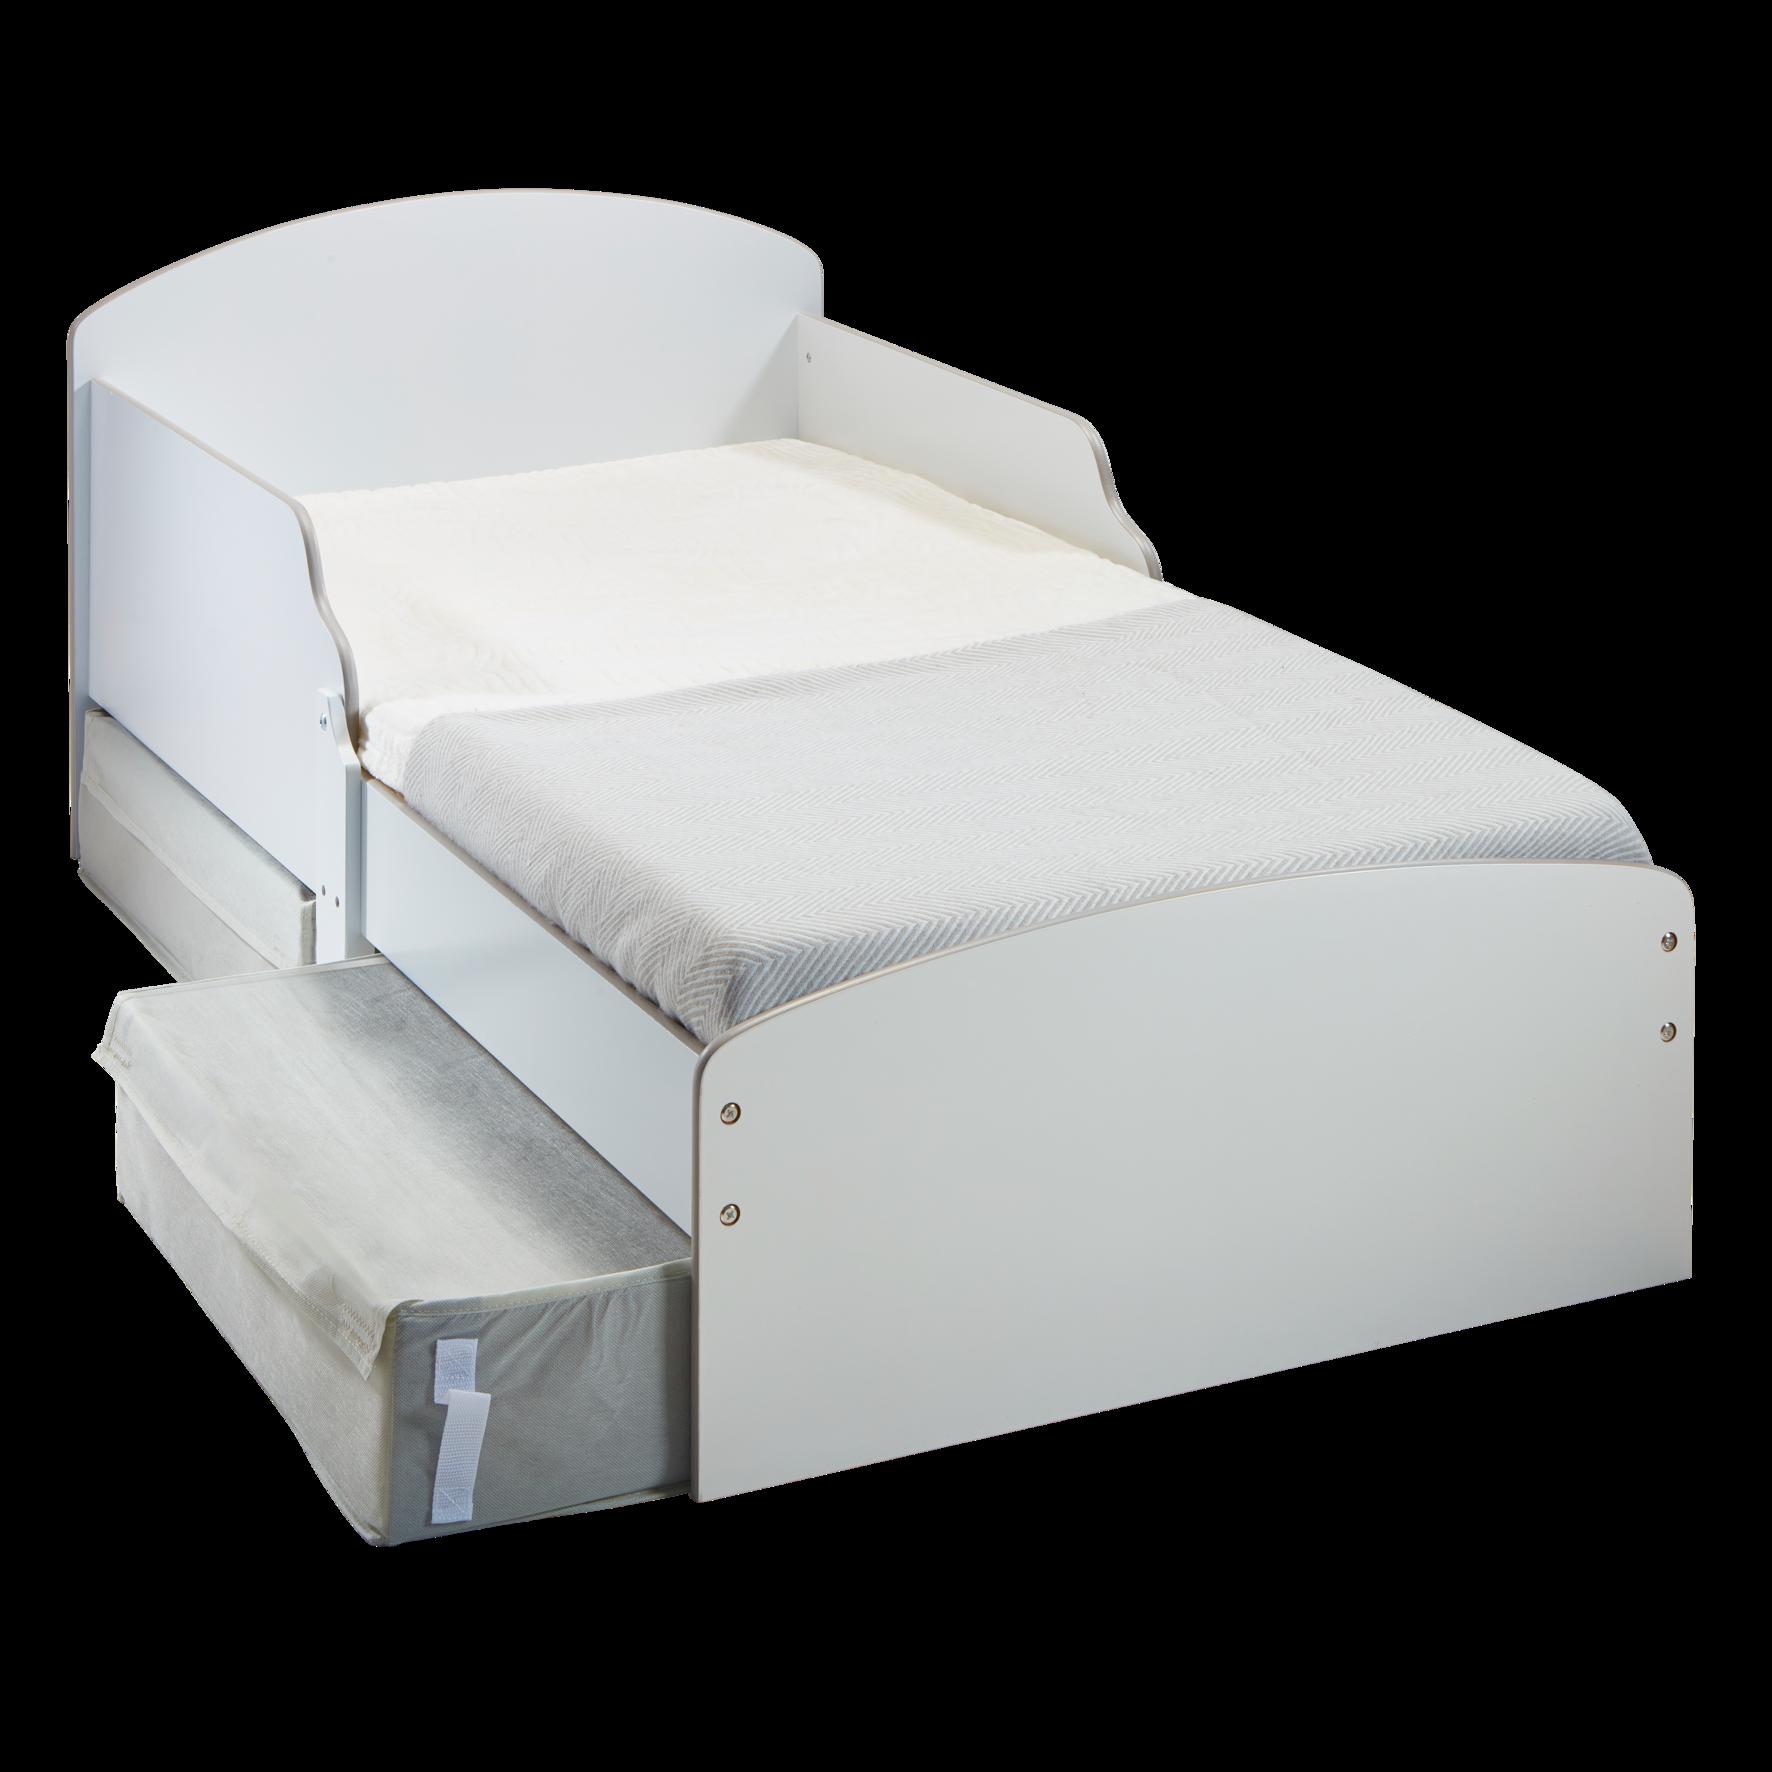 Kids White Toddler Bed with Storage (516GWH01EM)